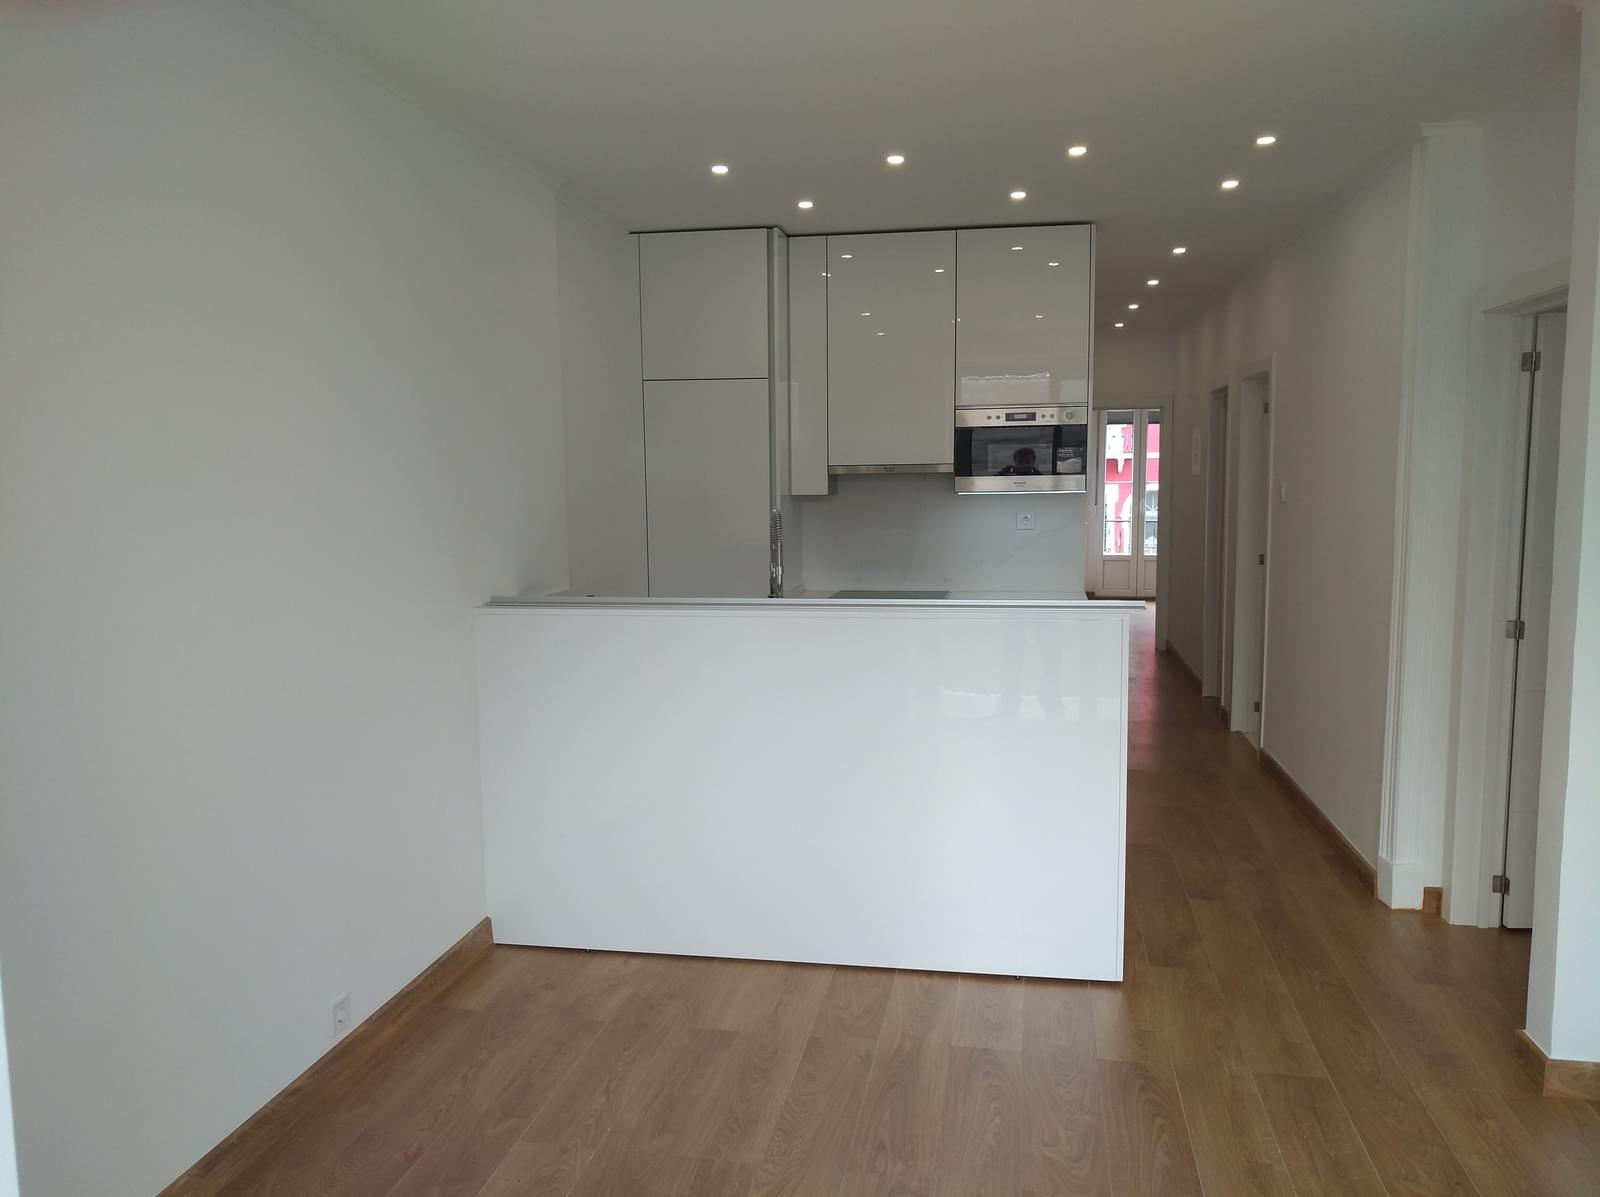 pf17316-apartamento-t2-lisboa-7b23cd89-4655-4f96-92ed-c3411fe40ee0